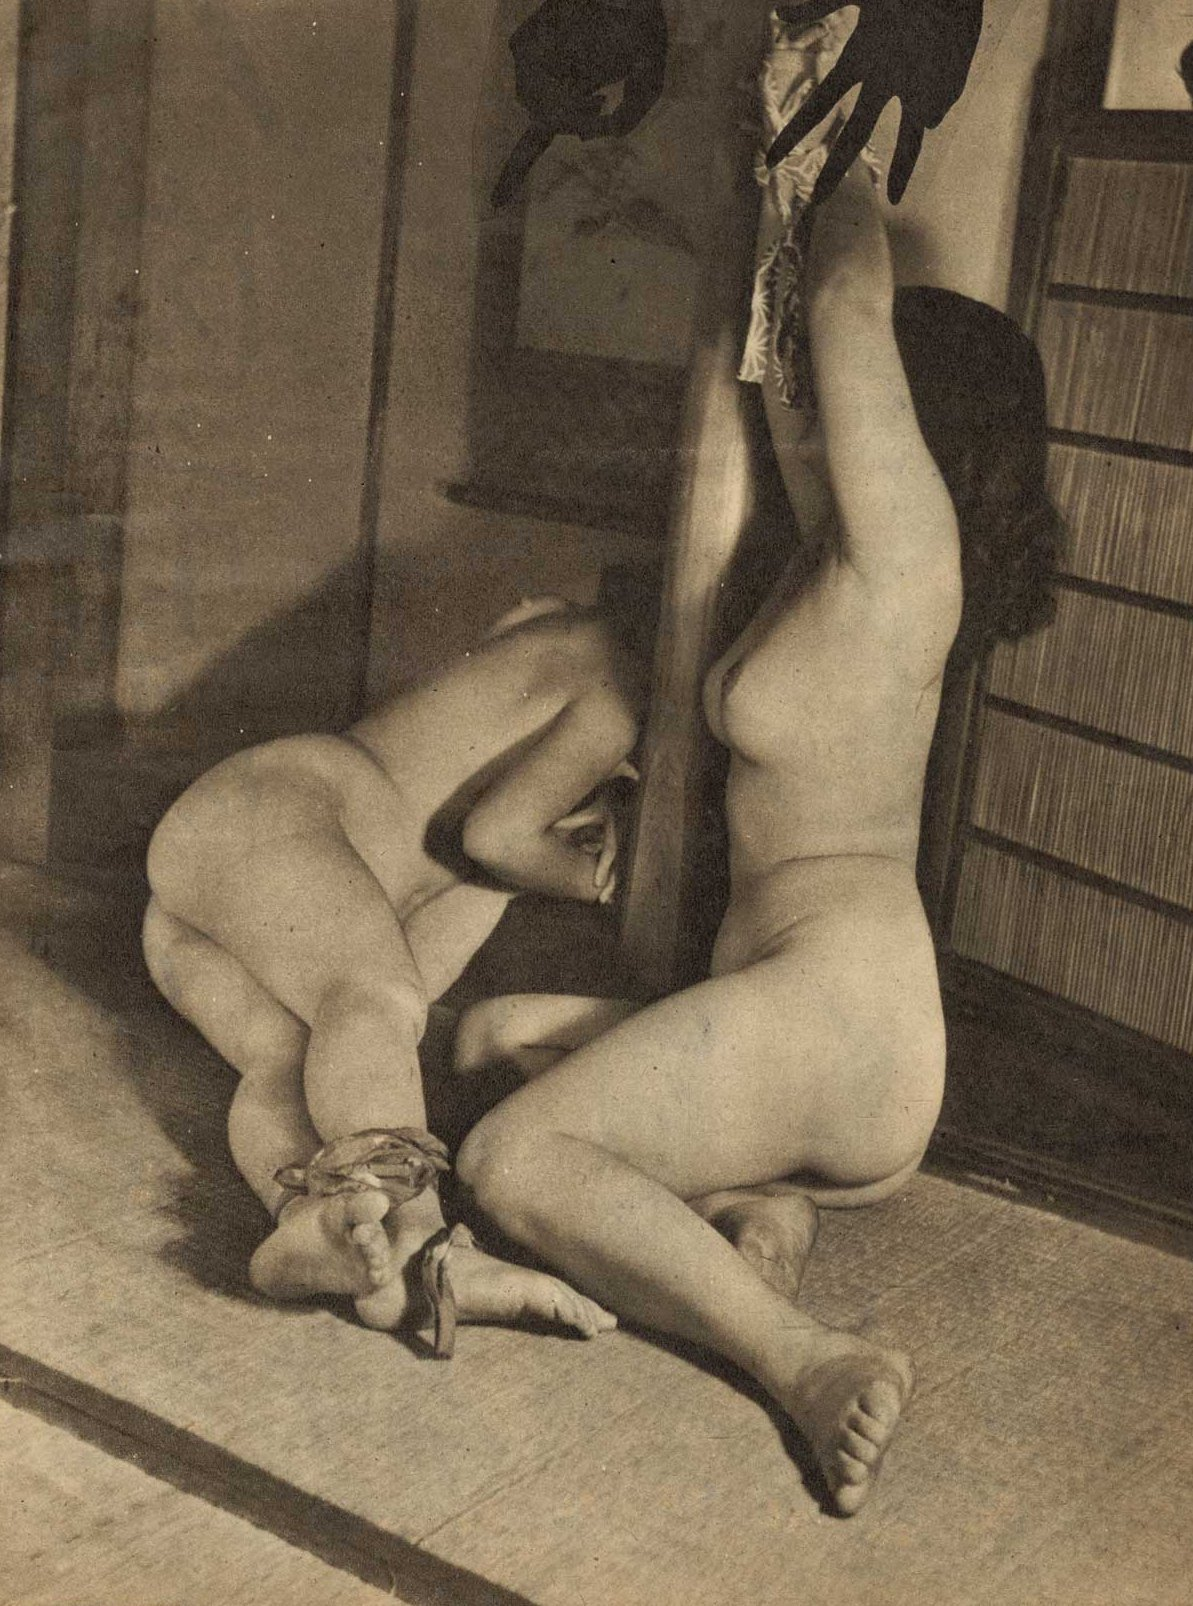 That's something bondage in play woman 7009 afraid